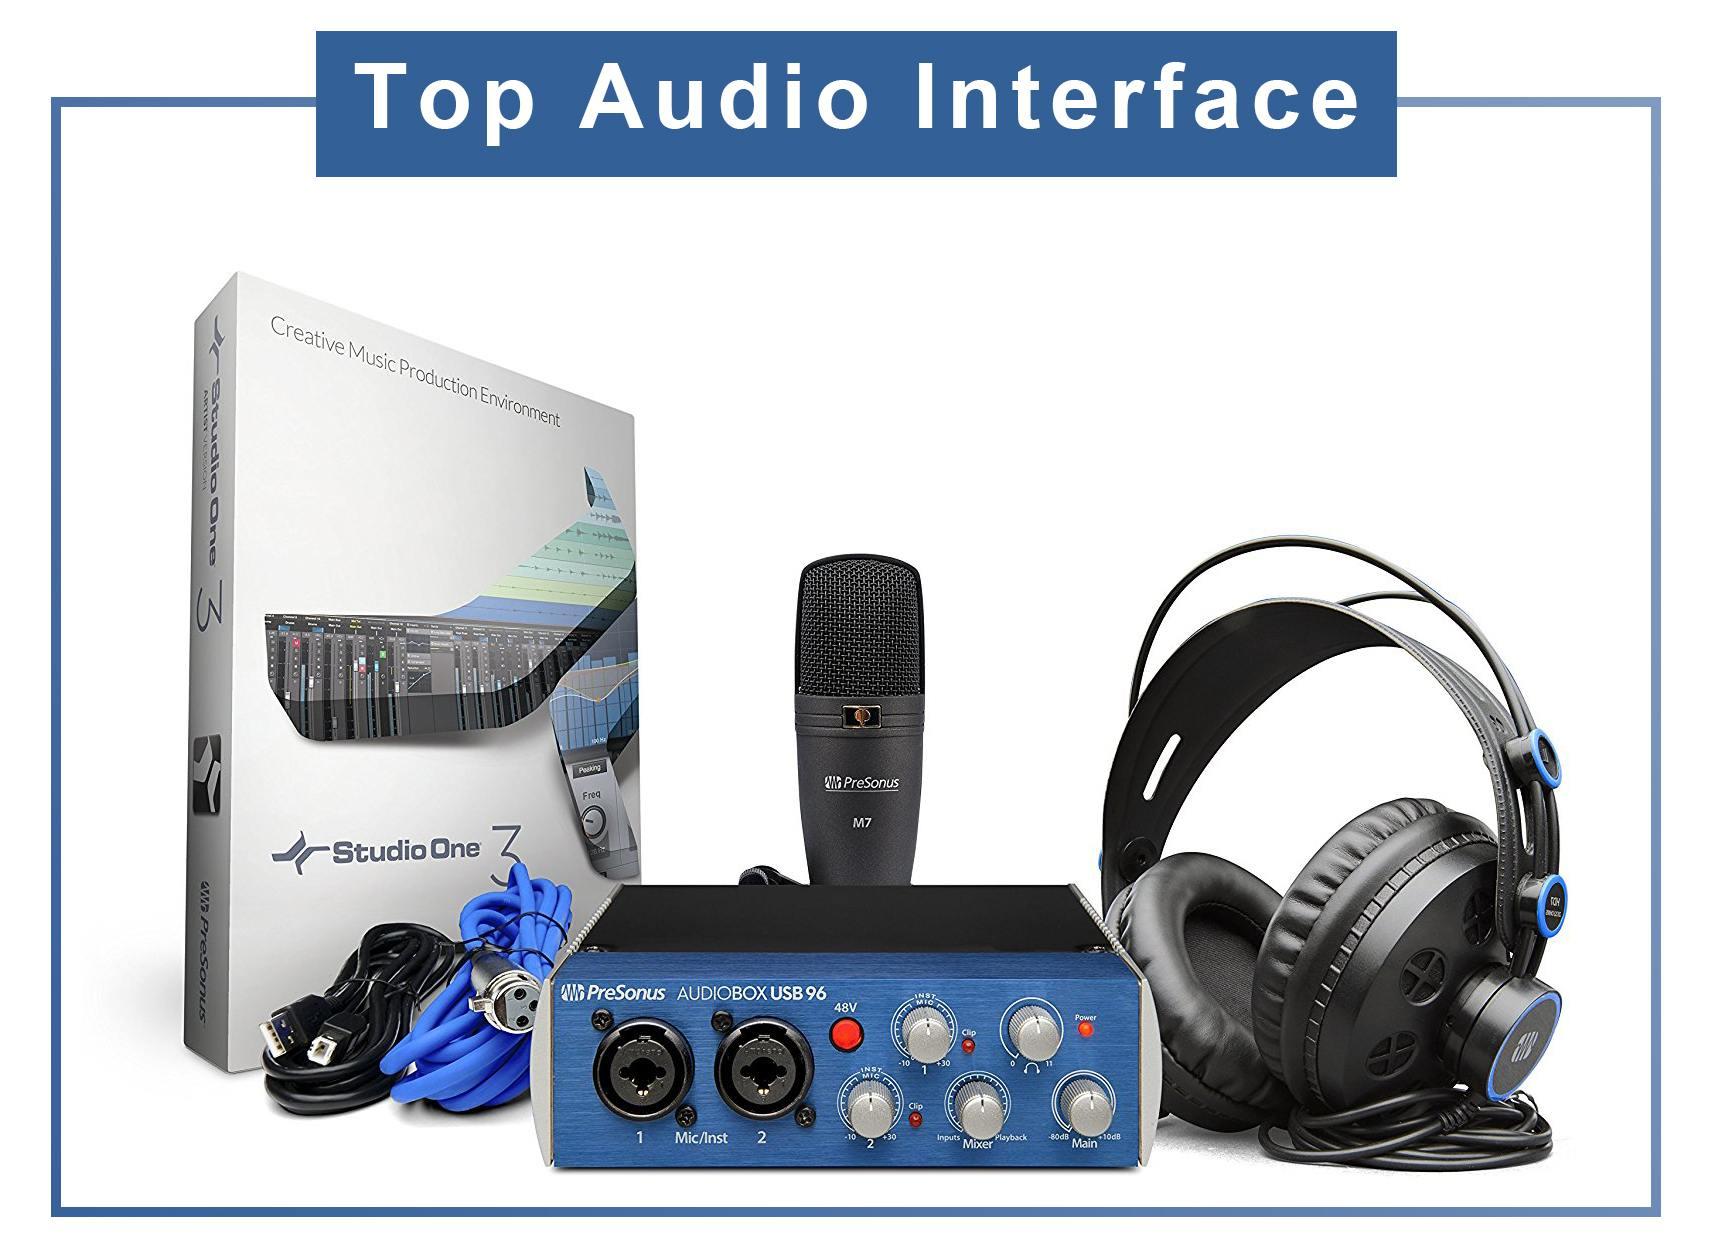 Top Audio Interface